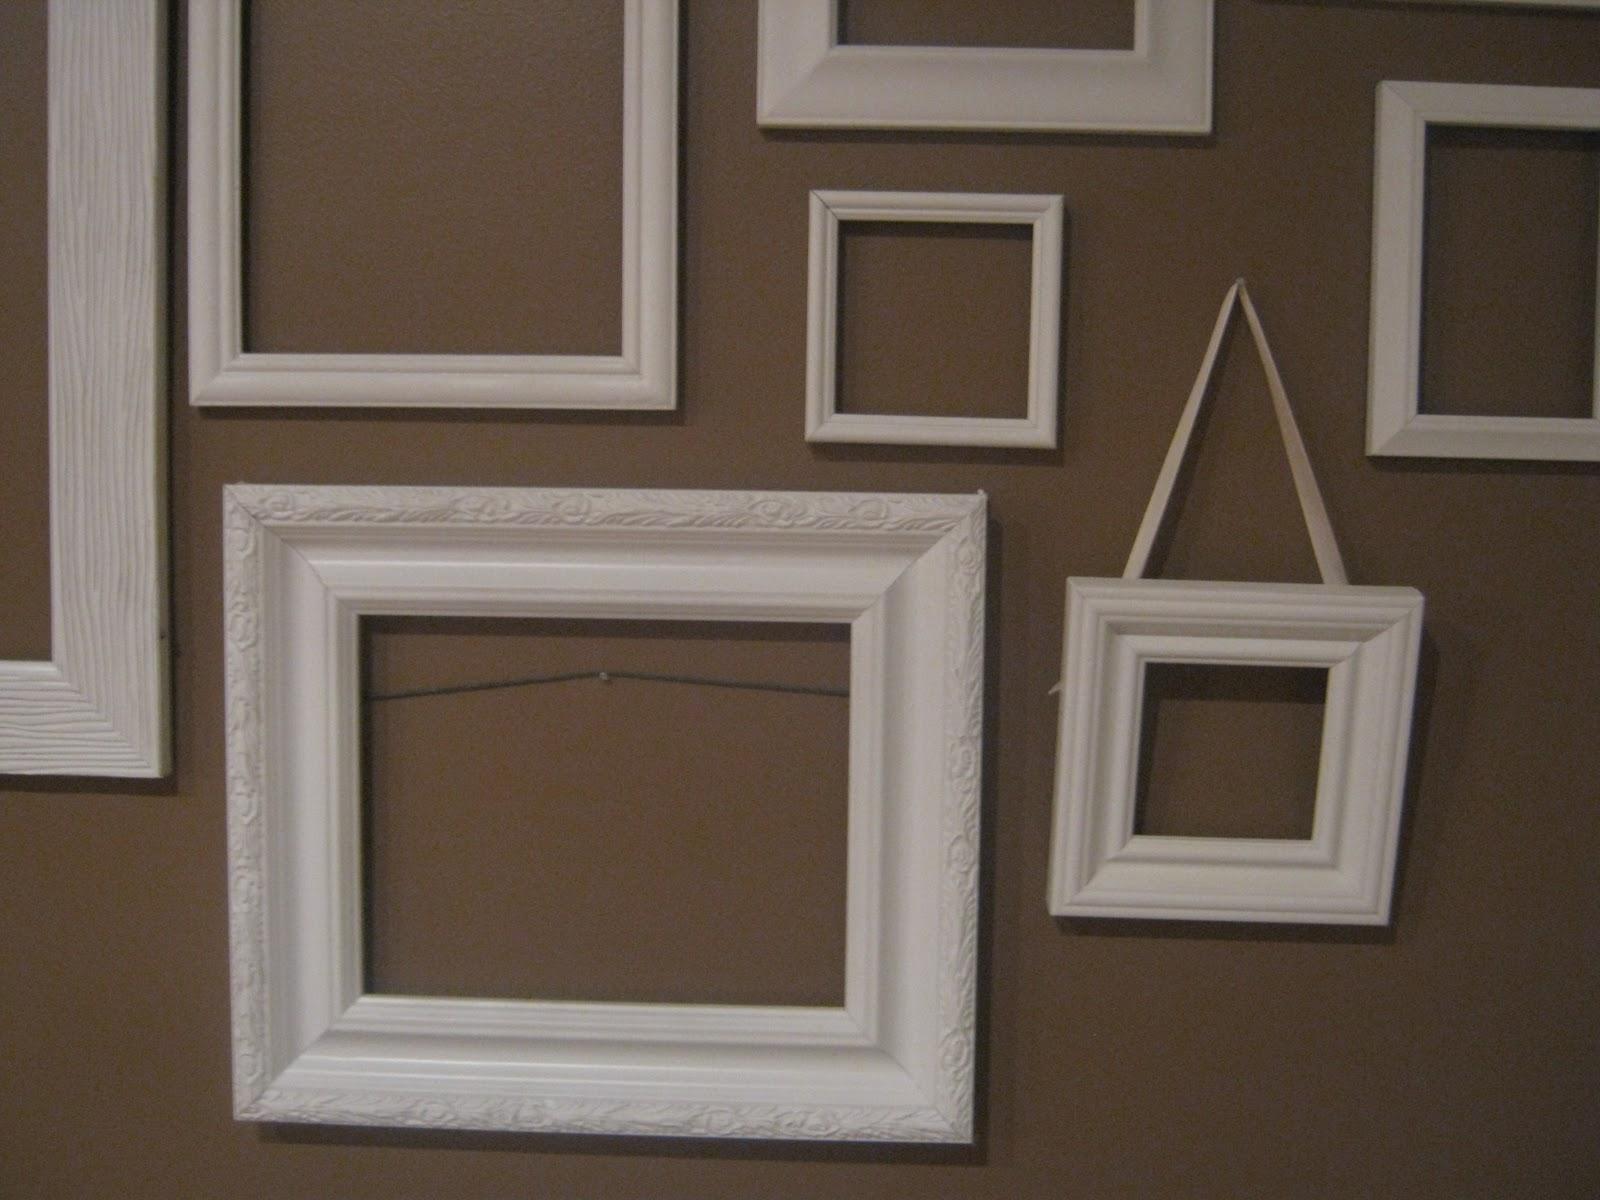 Dwelling & Telling DIY Empty Frame Collage